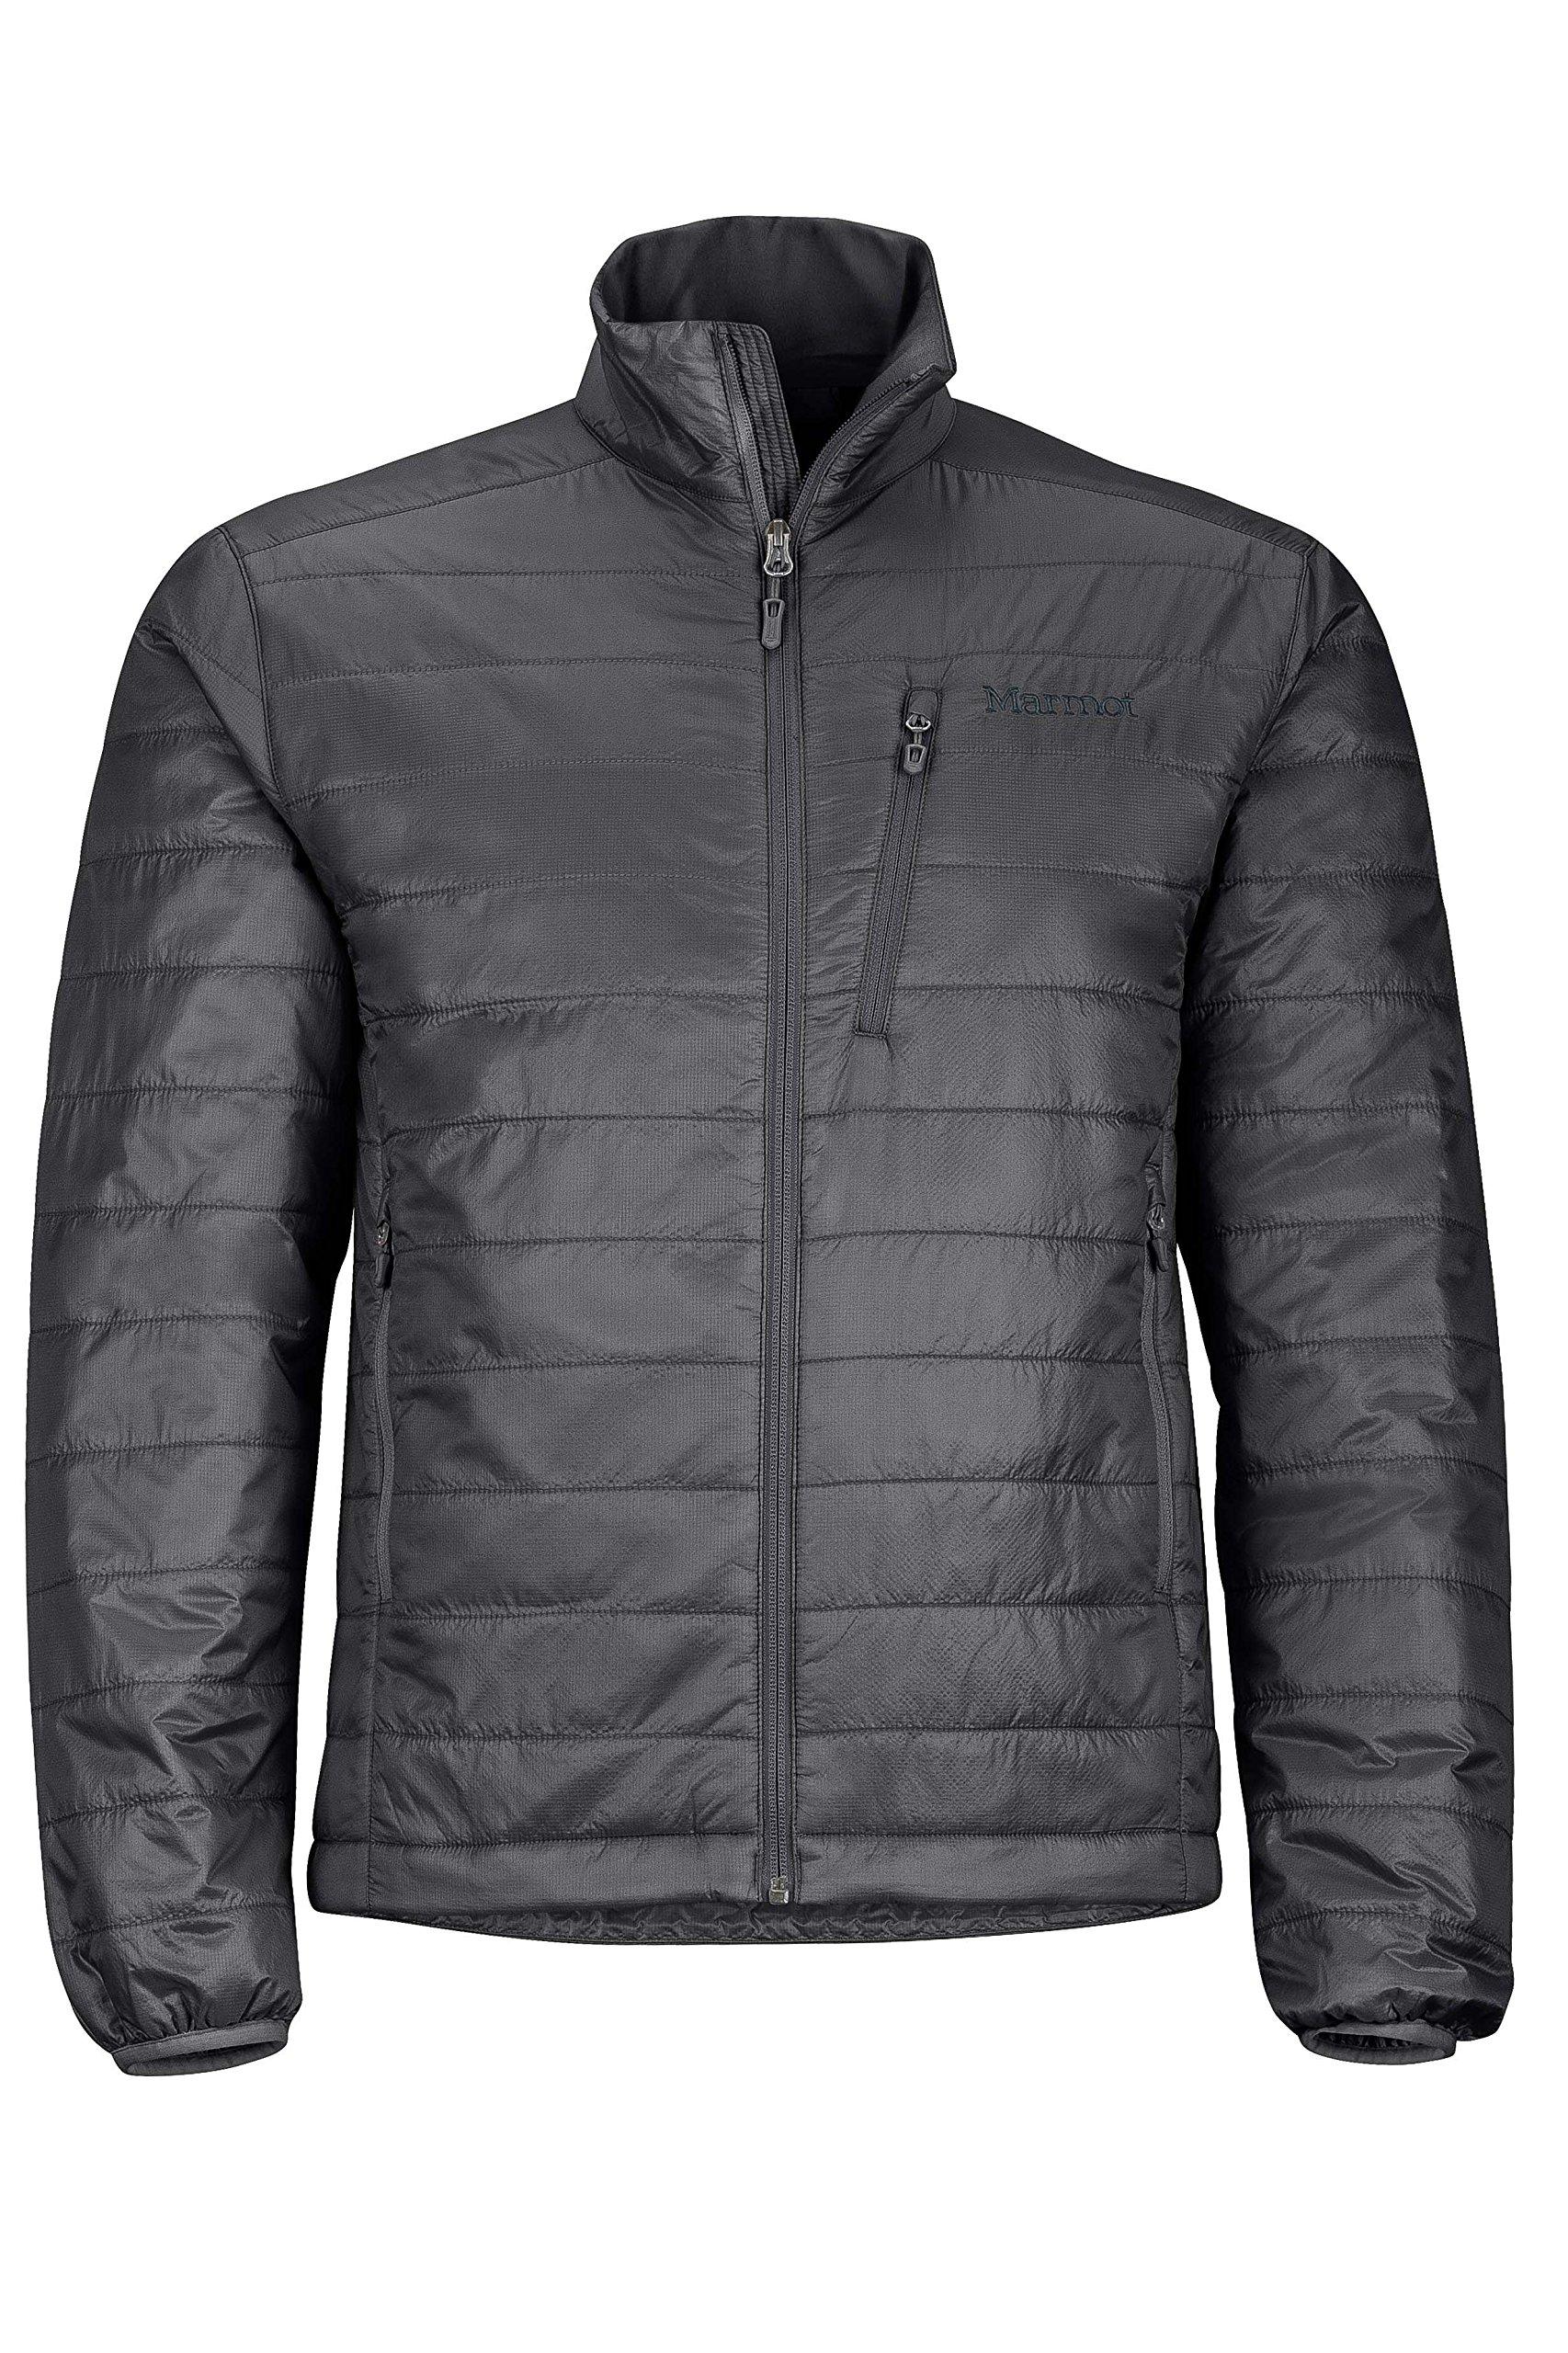 Marmot Men's Calen Insulated Puffer Jacket, Jet Black, Large by Marmot